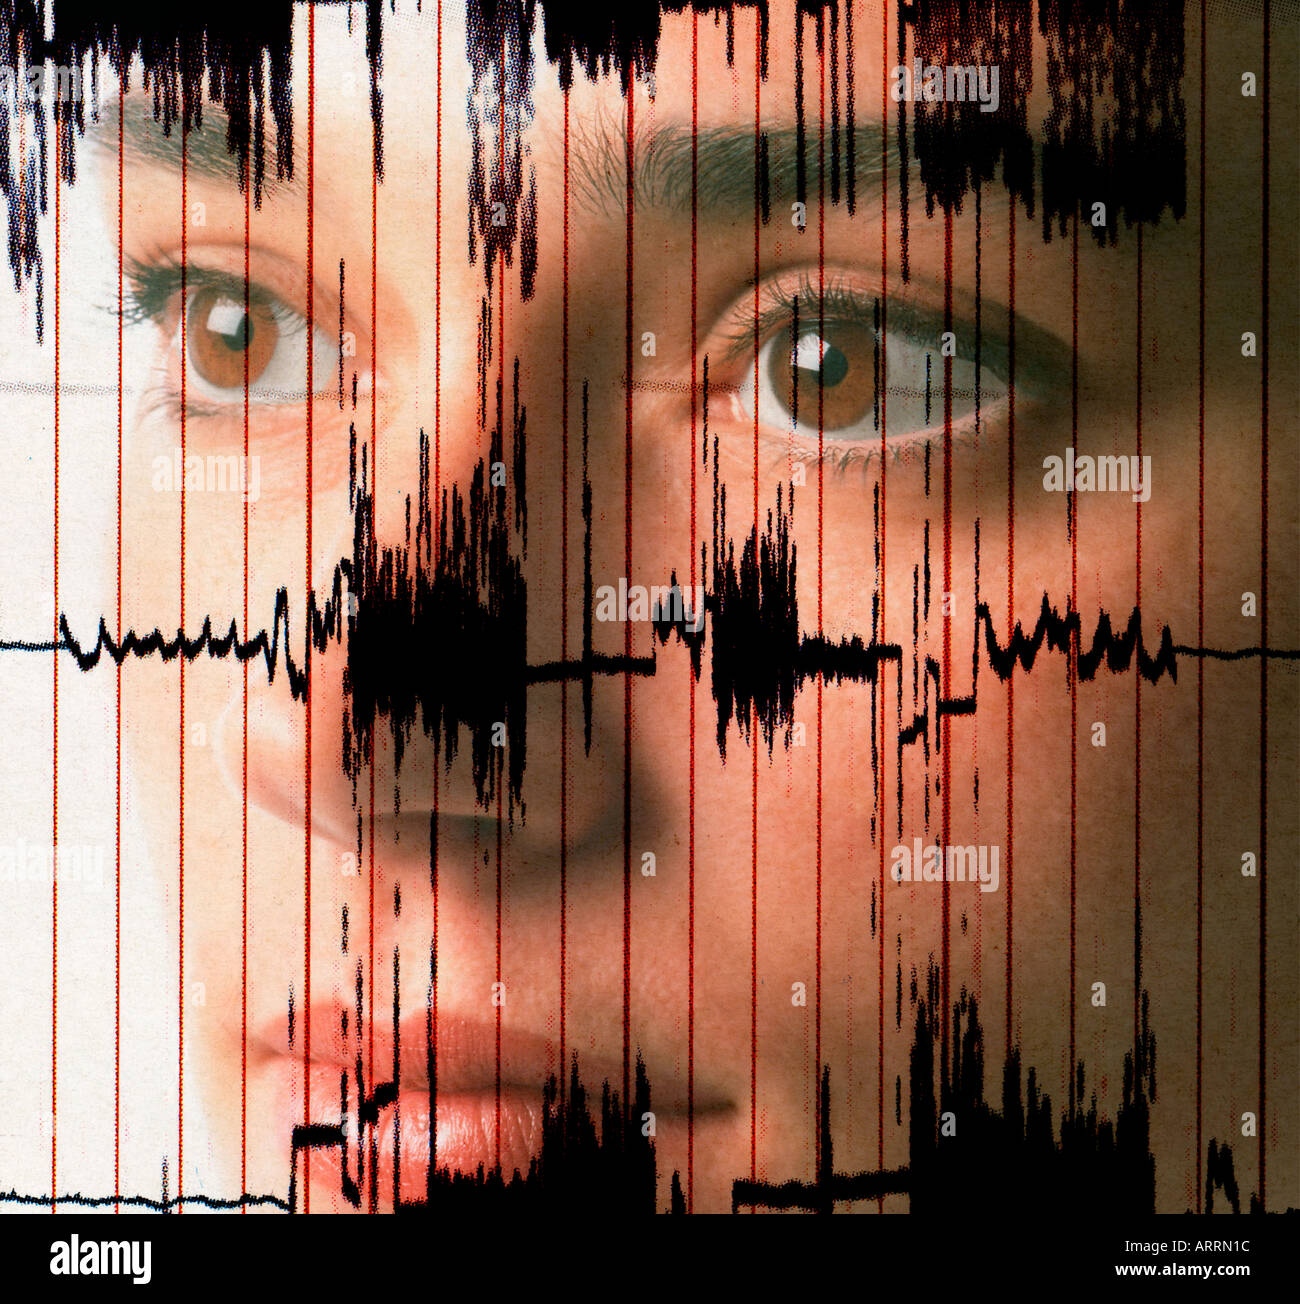 Doctora control EKG Concepto de prueba Imagen De Stock